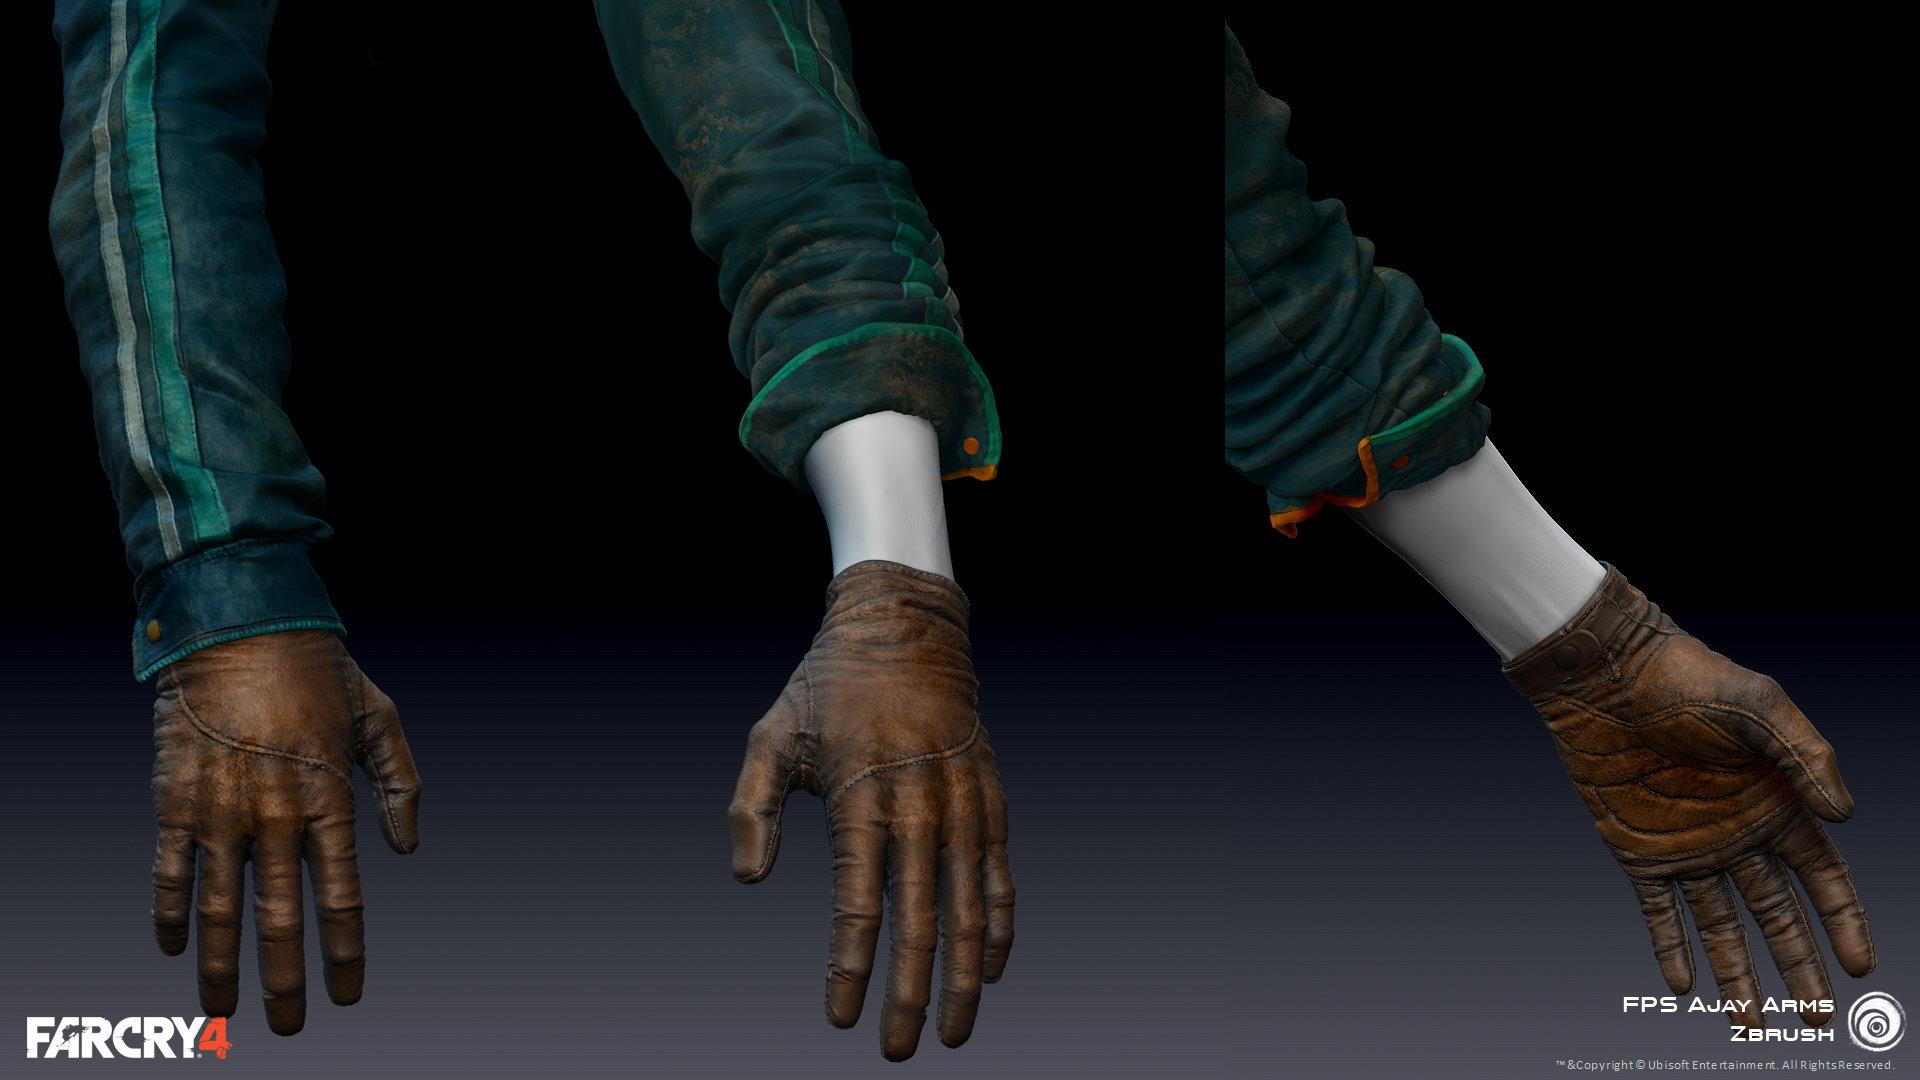 Zbrush Polypaint/texture| FPS Hands